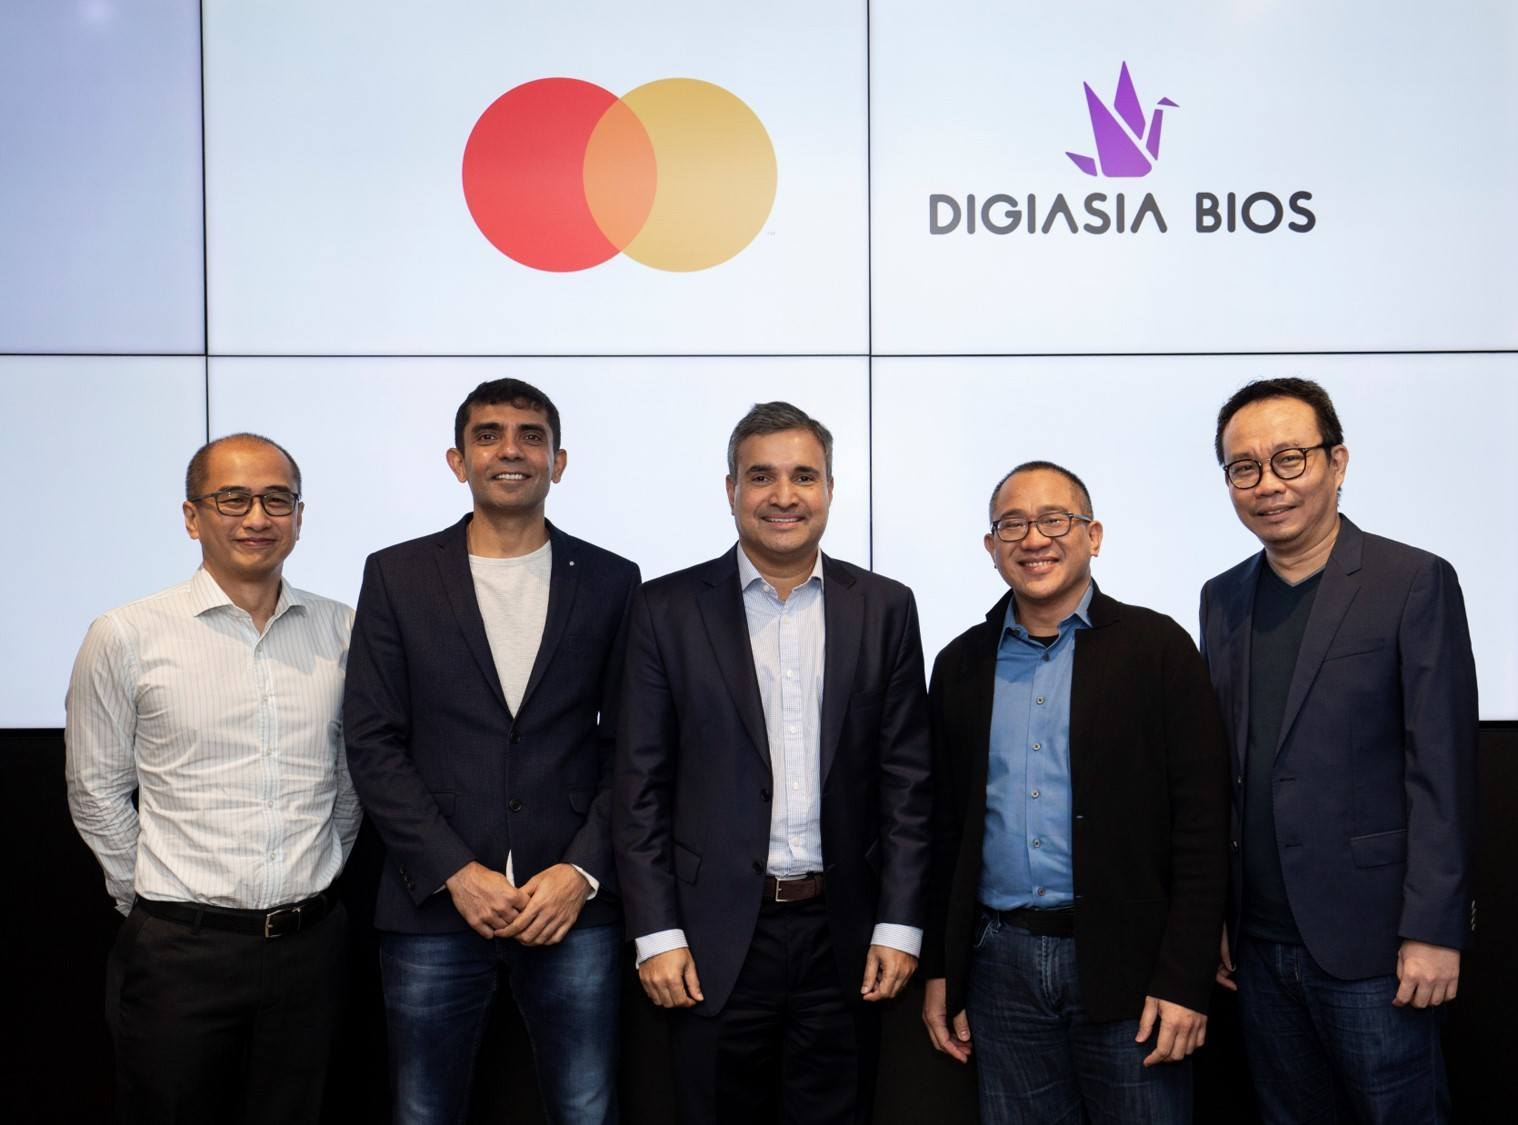 Mastercard Leads Digiasia Bios Startup's Series B Funding